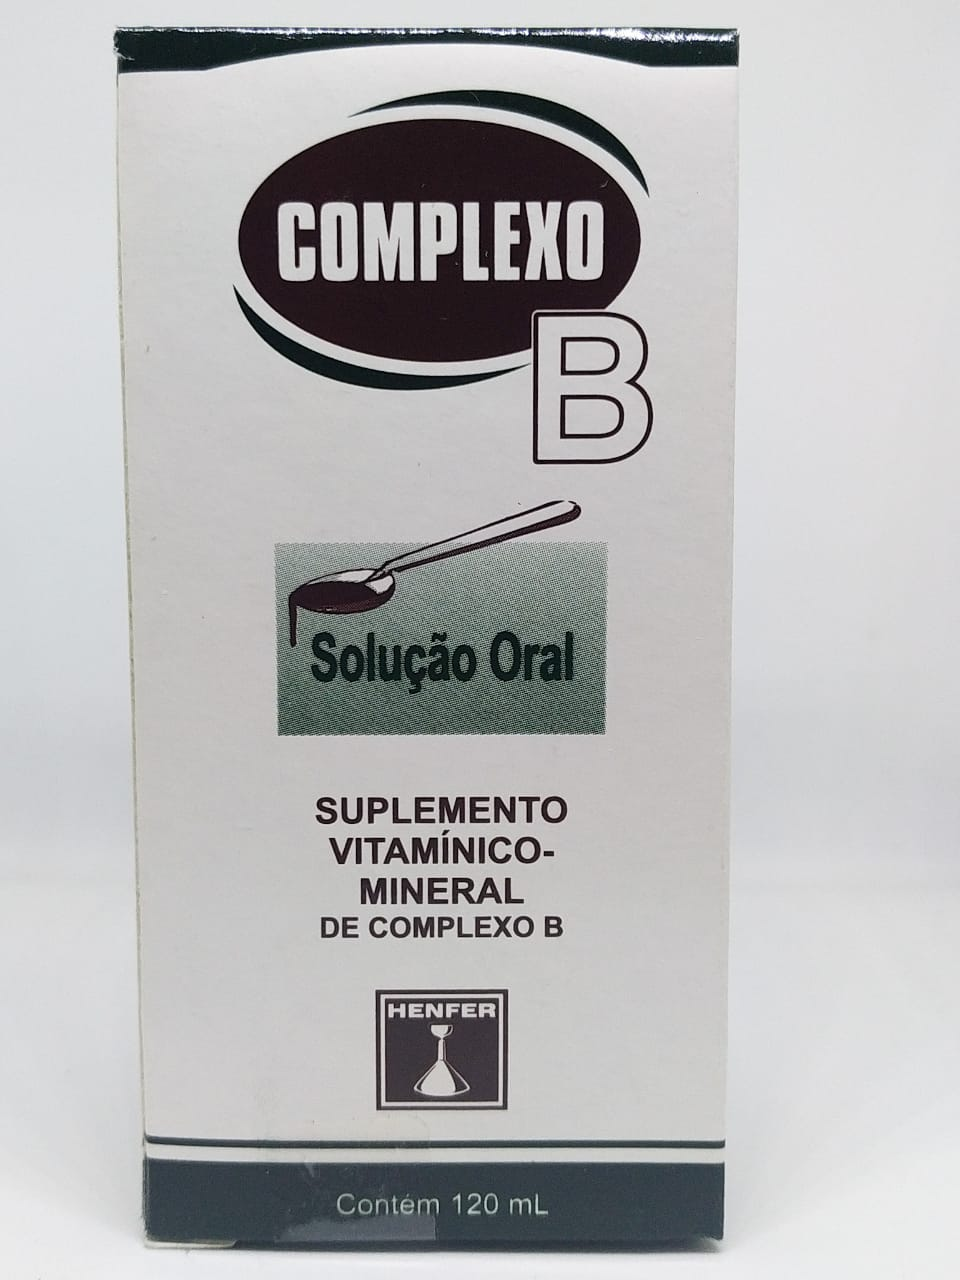 COMPLEXO B XAROPE 120ML HENFER